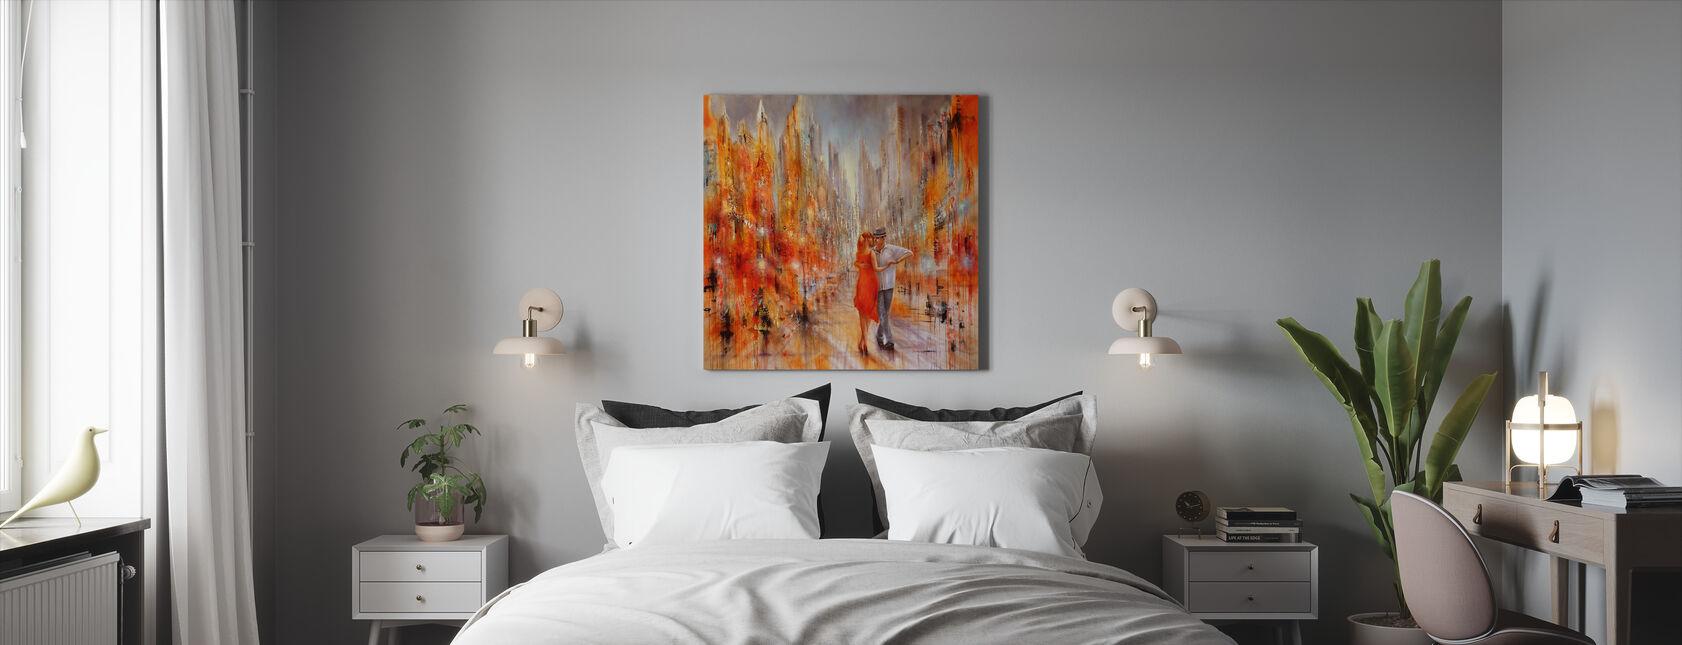 Salsa - Canvas print - Slaapkamer